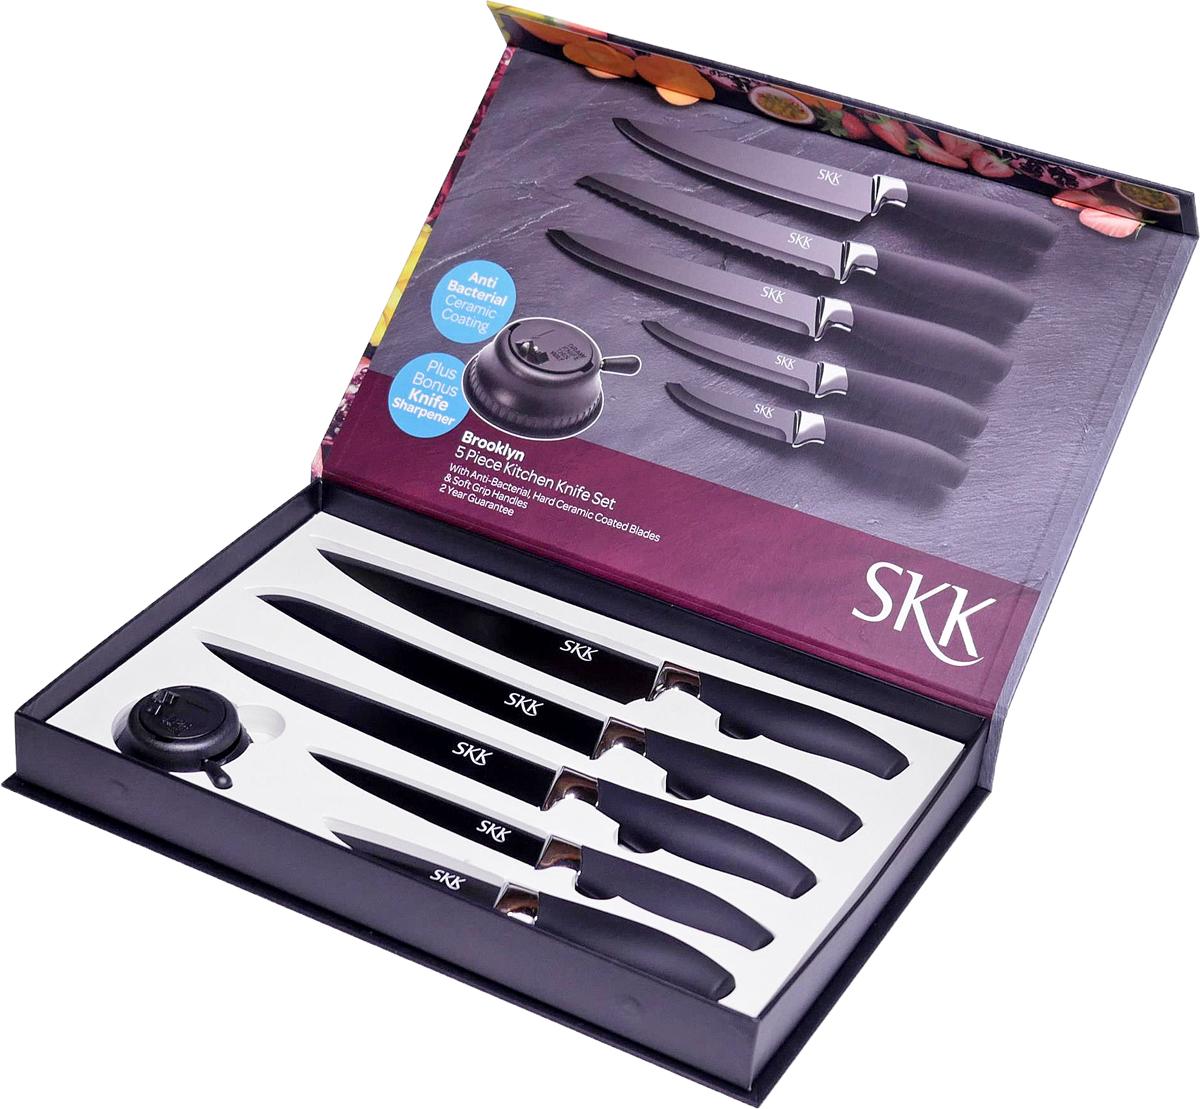 Набор кухонных ножей SKK Line Brooklyn, 5 предметов набор кухонных ножей 3 шт 7941 clasica серия clasica